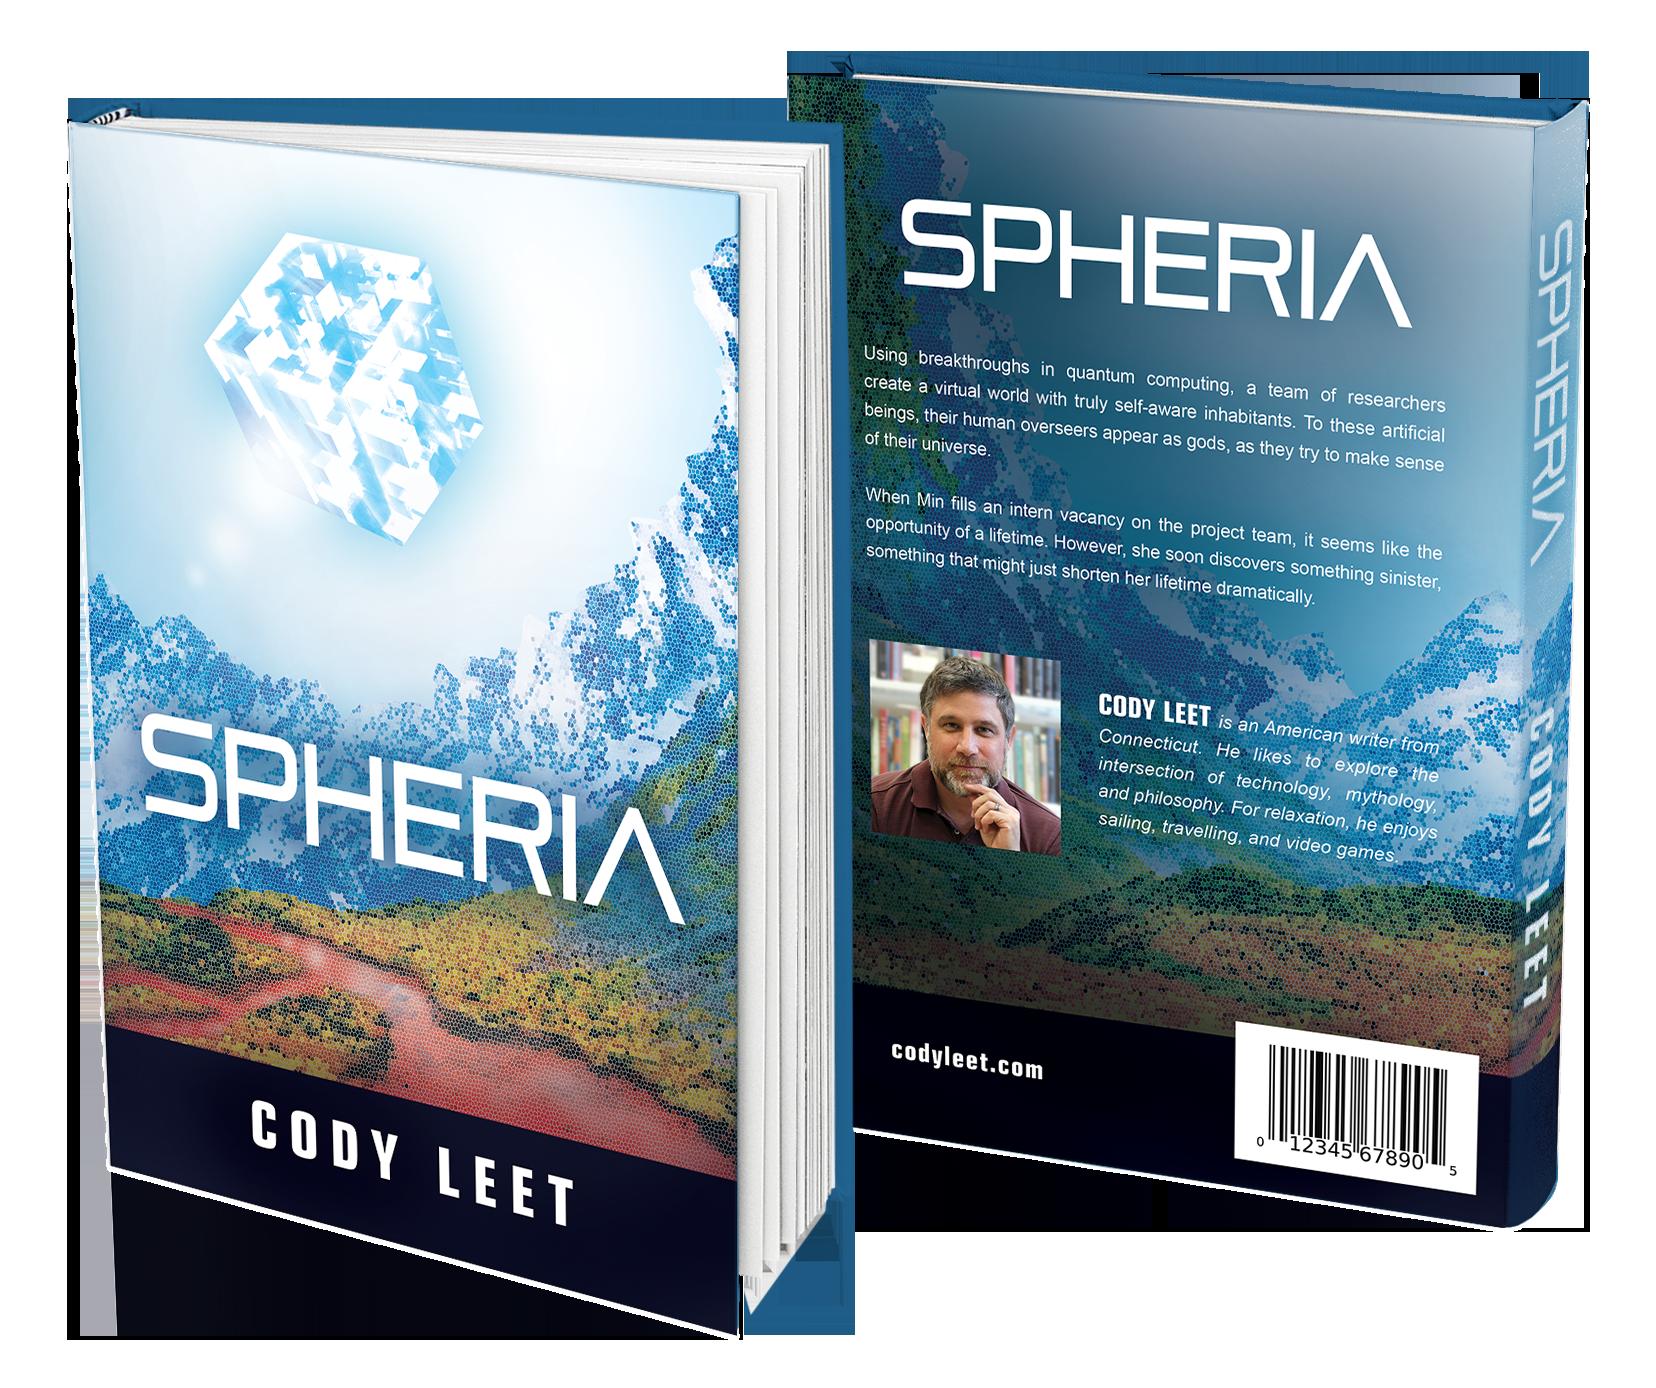 Create a cover for the novel Spheria